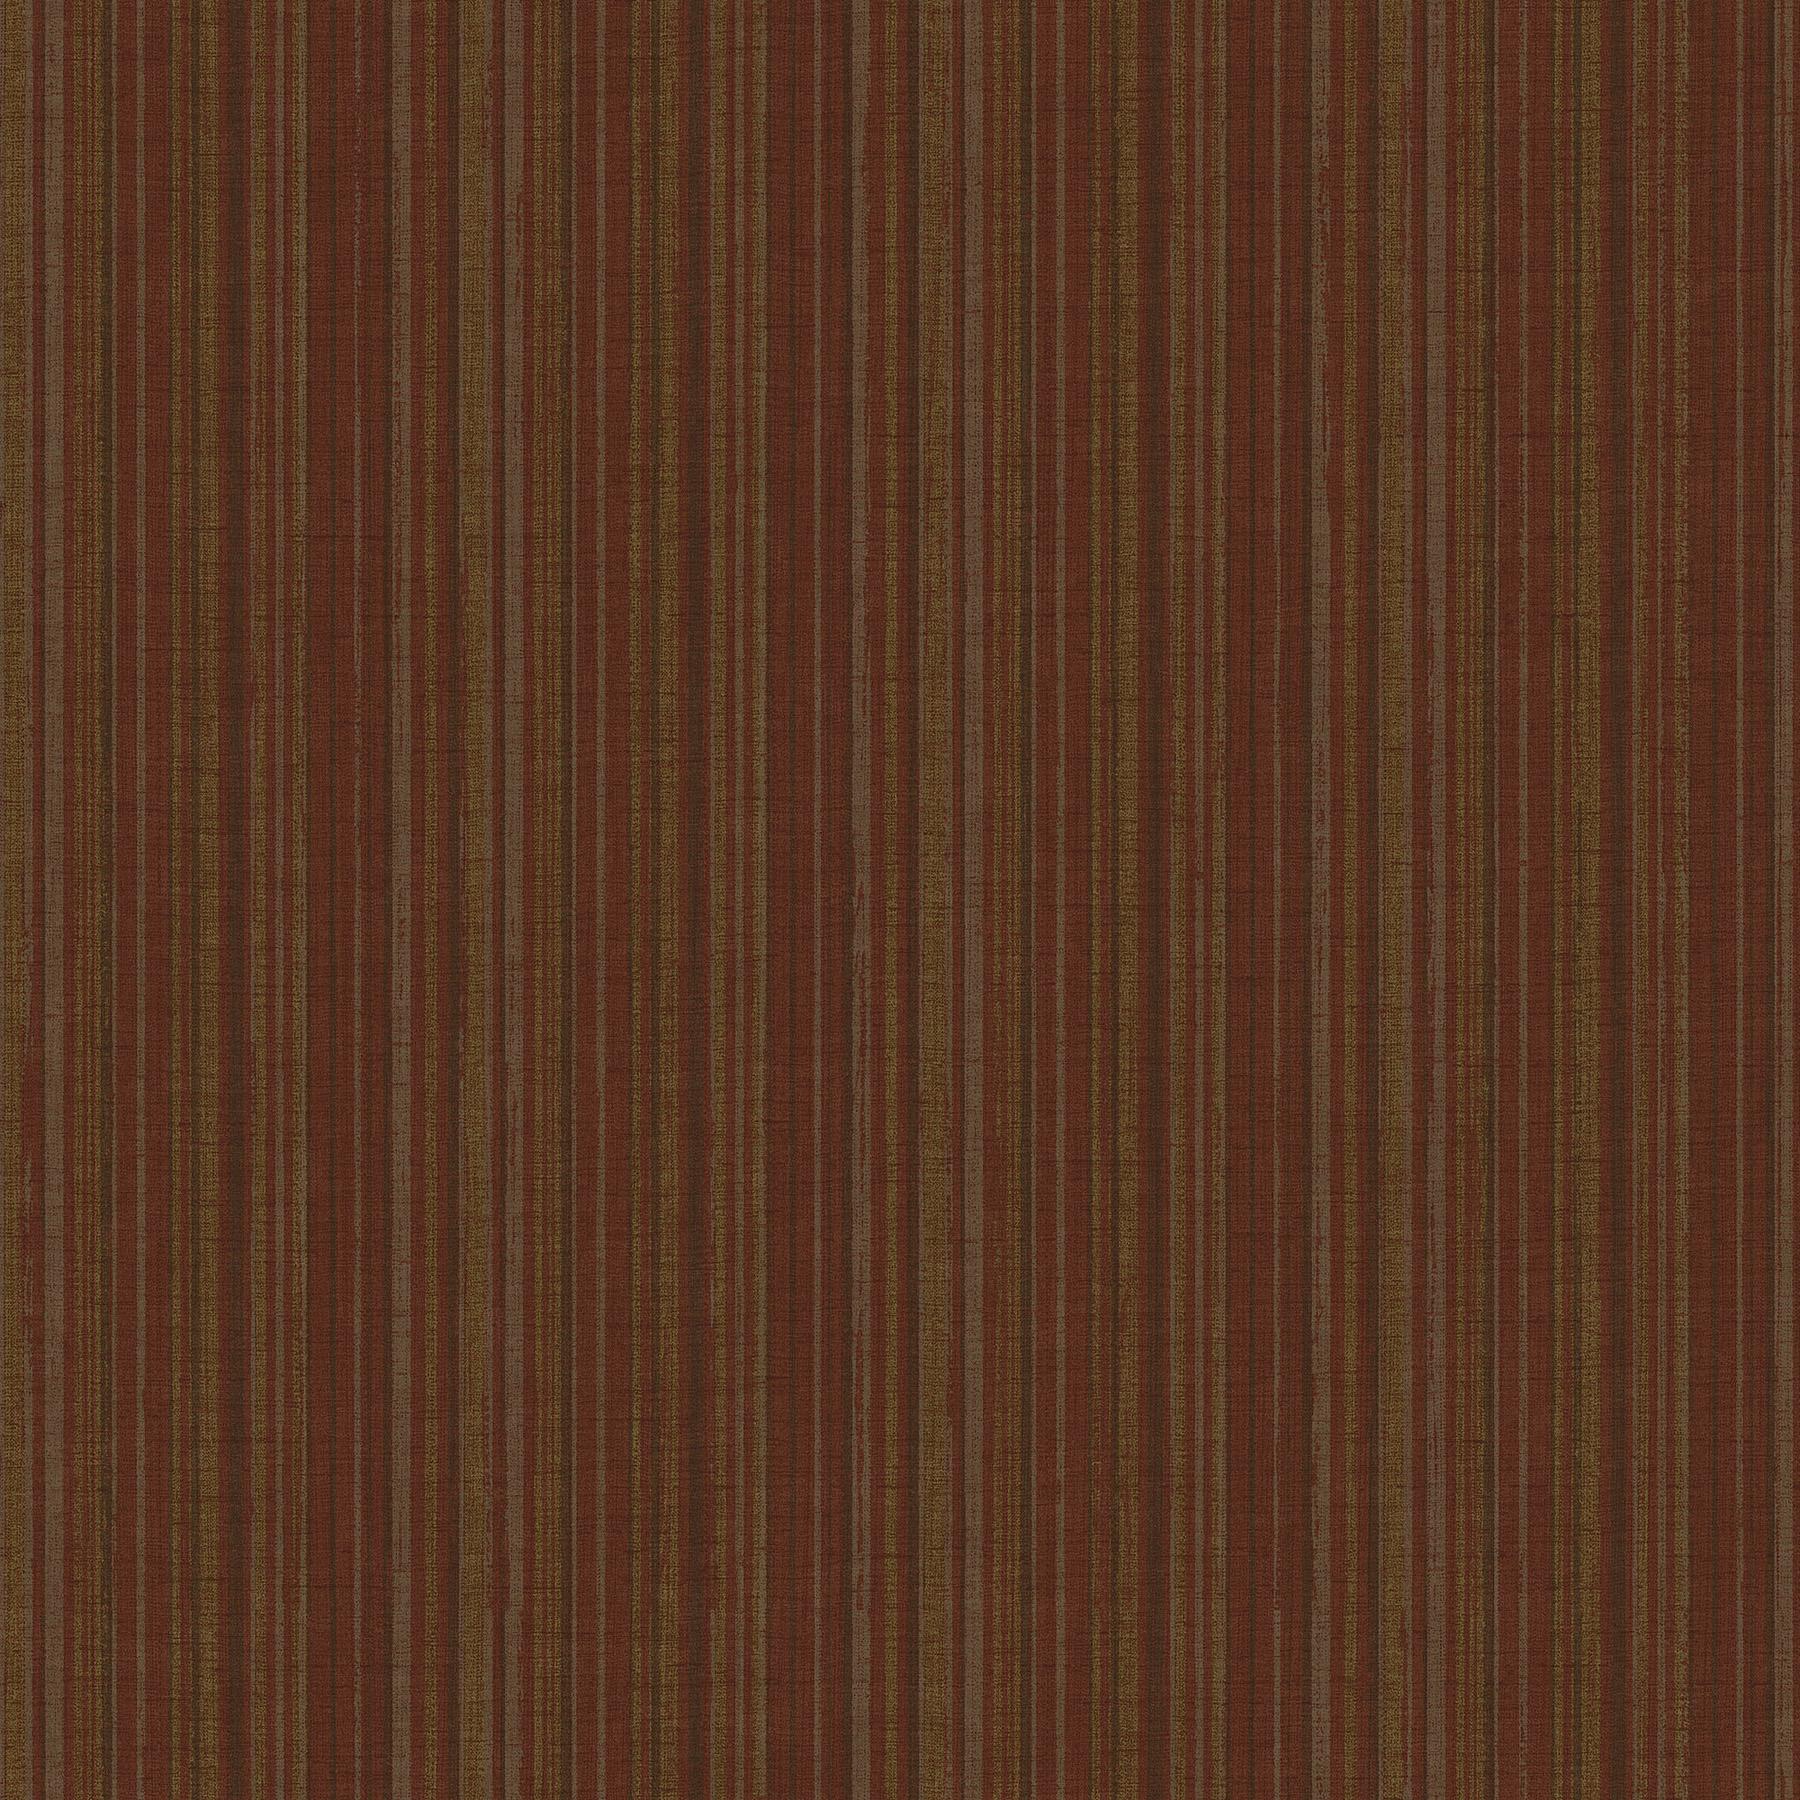 Picture of Brick Mutli Stripe Wallpaper